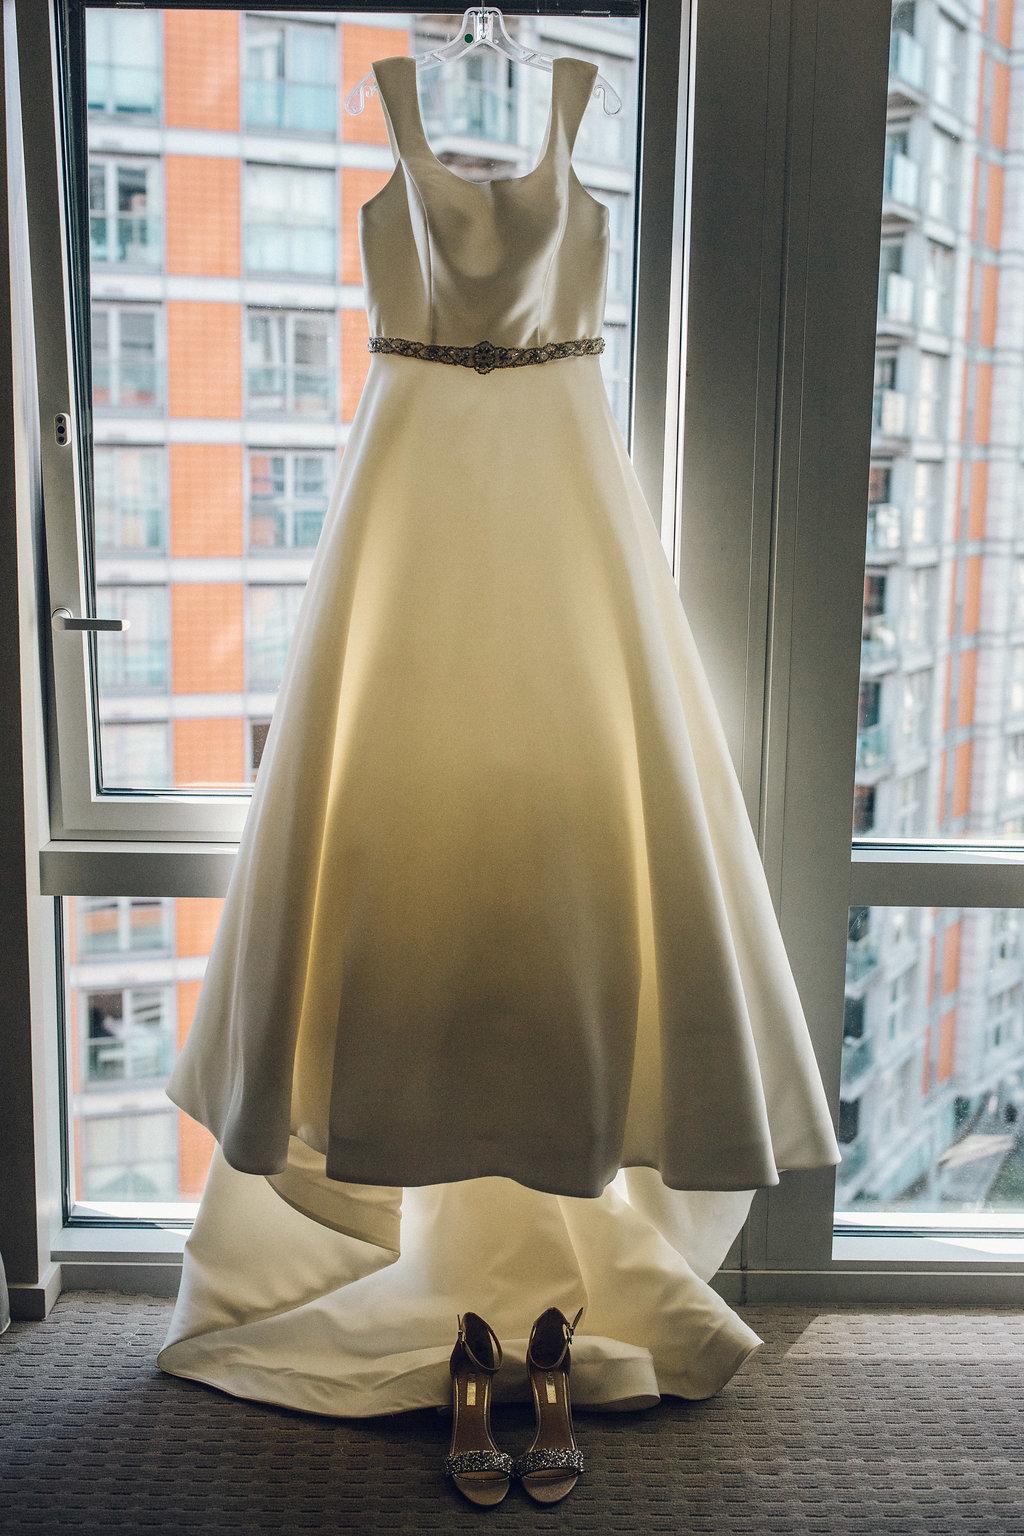 Bridal gown hanging up - Raddison Blu, Poplar